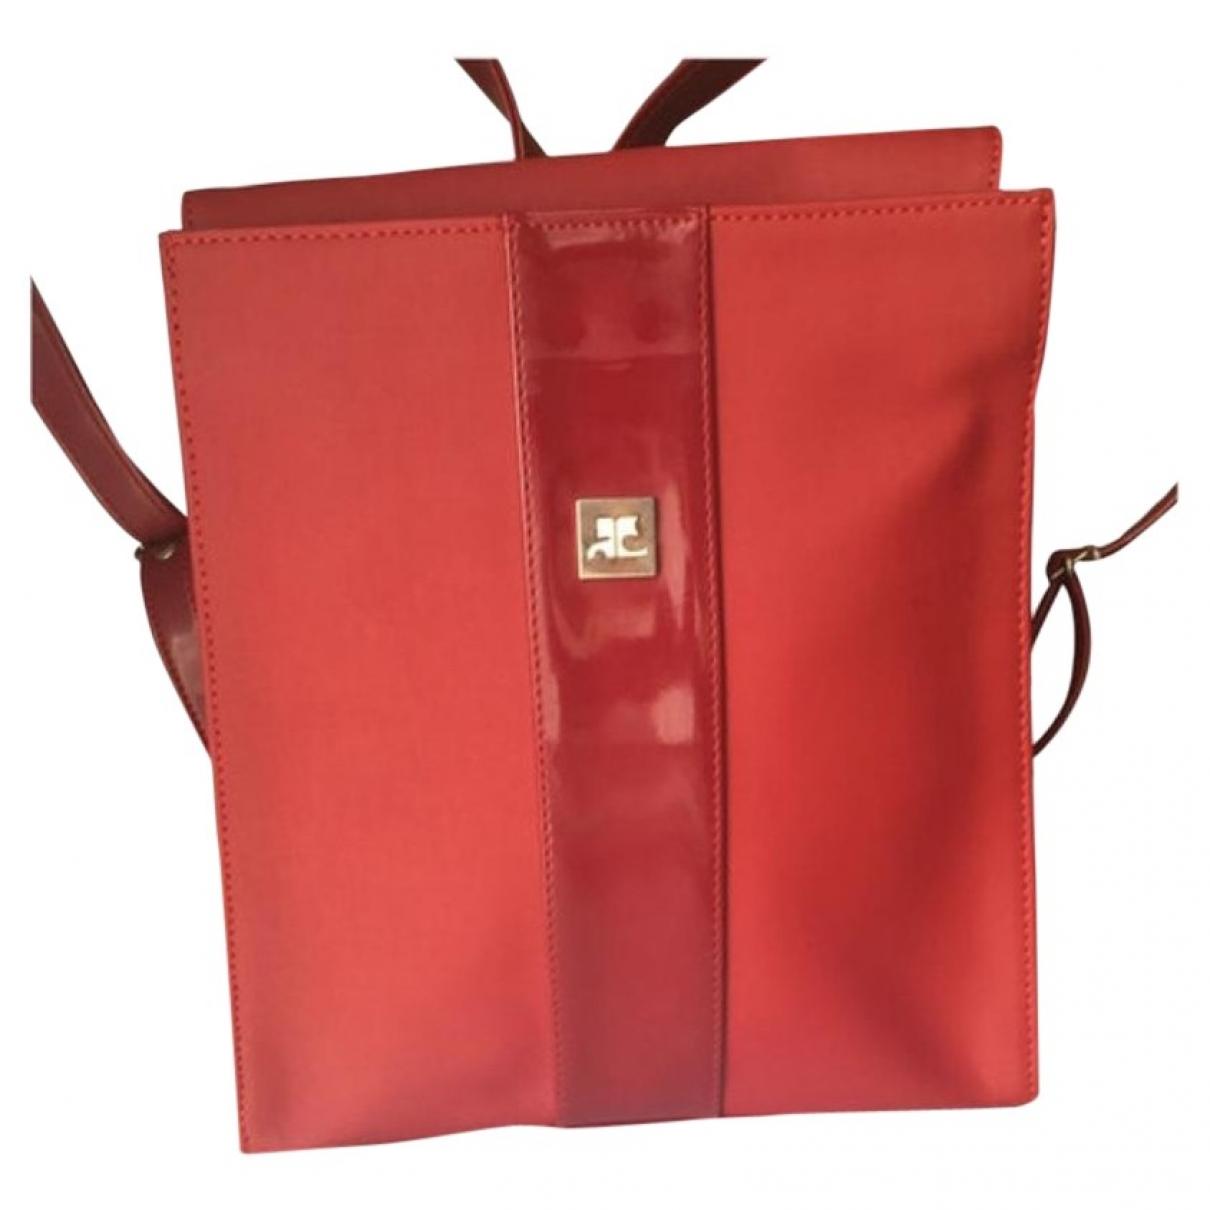 Courreges \N Rucksaecke in  Rot Kunststoff